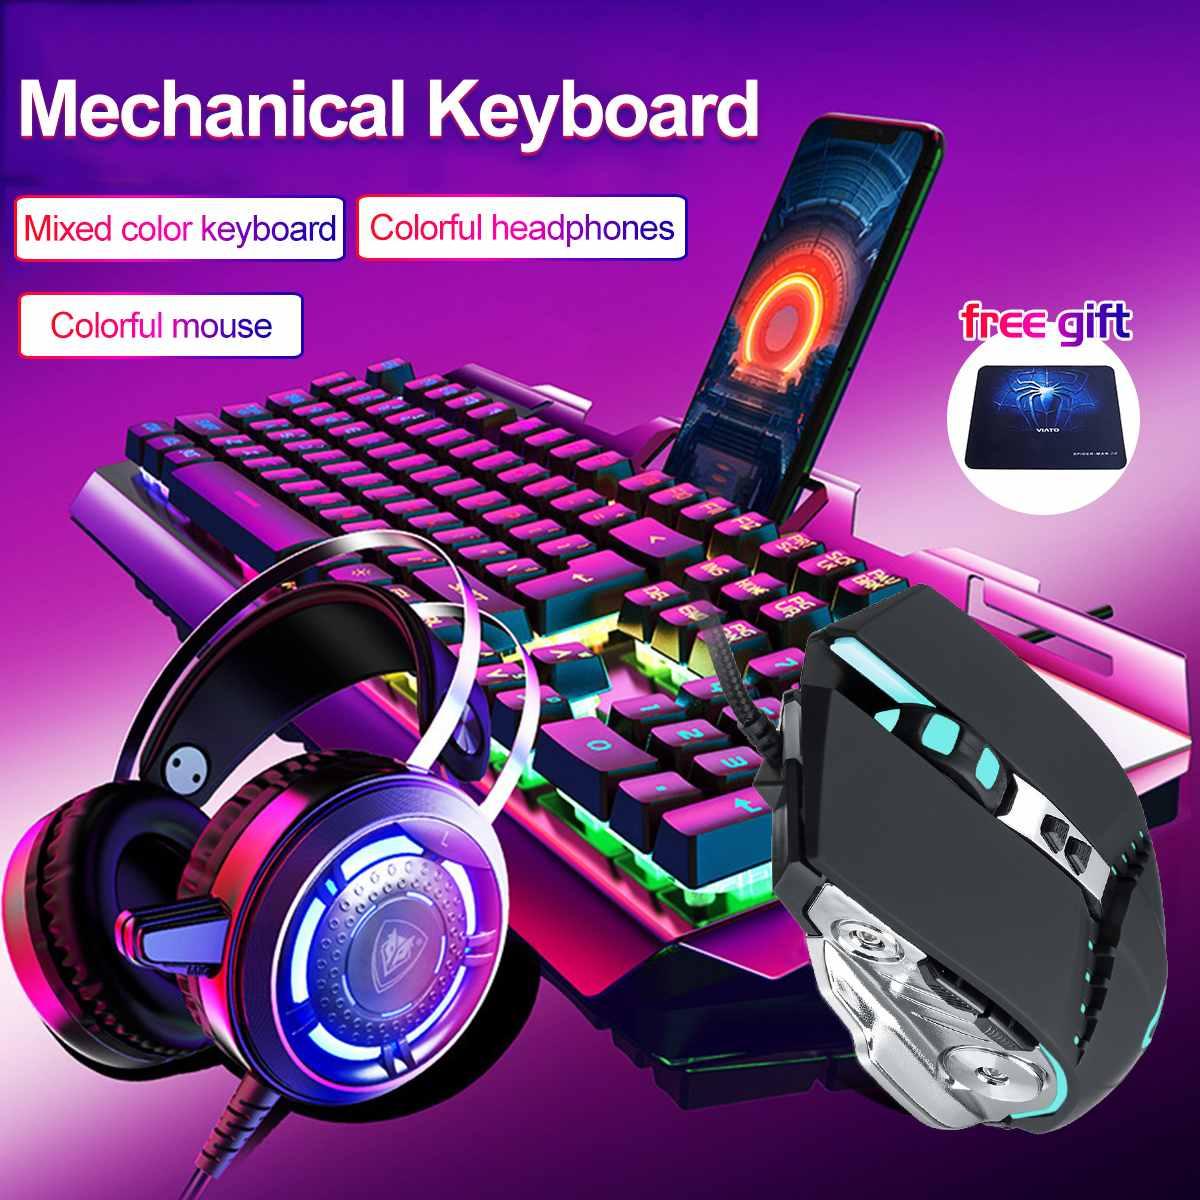 4Pcs USB 3200DPI Mouse Colorful Headset Rainbow Backlight Mechanical Keyboard Phone Holder Set Pad for Desktop Computer Notebo